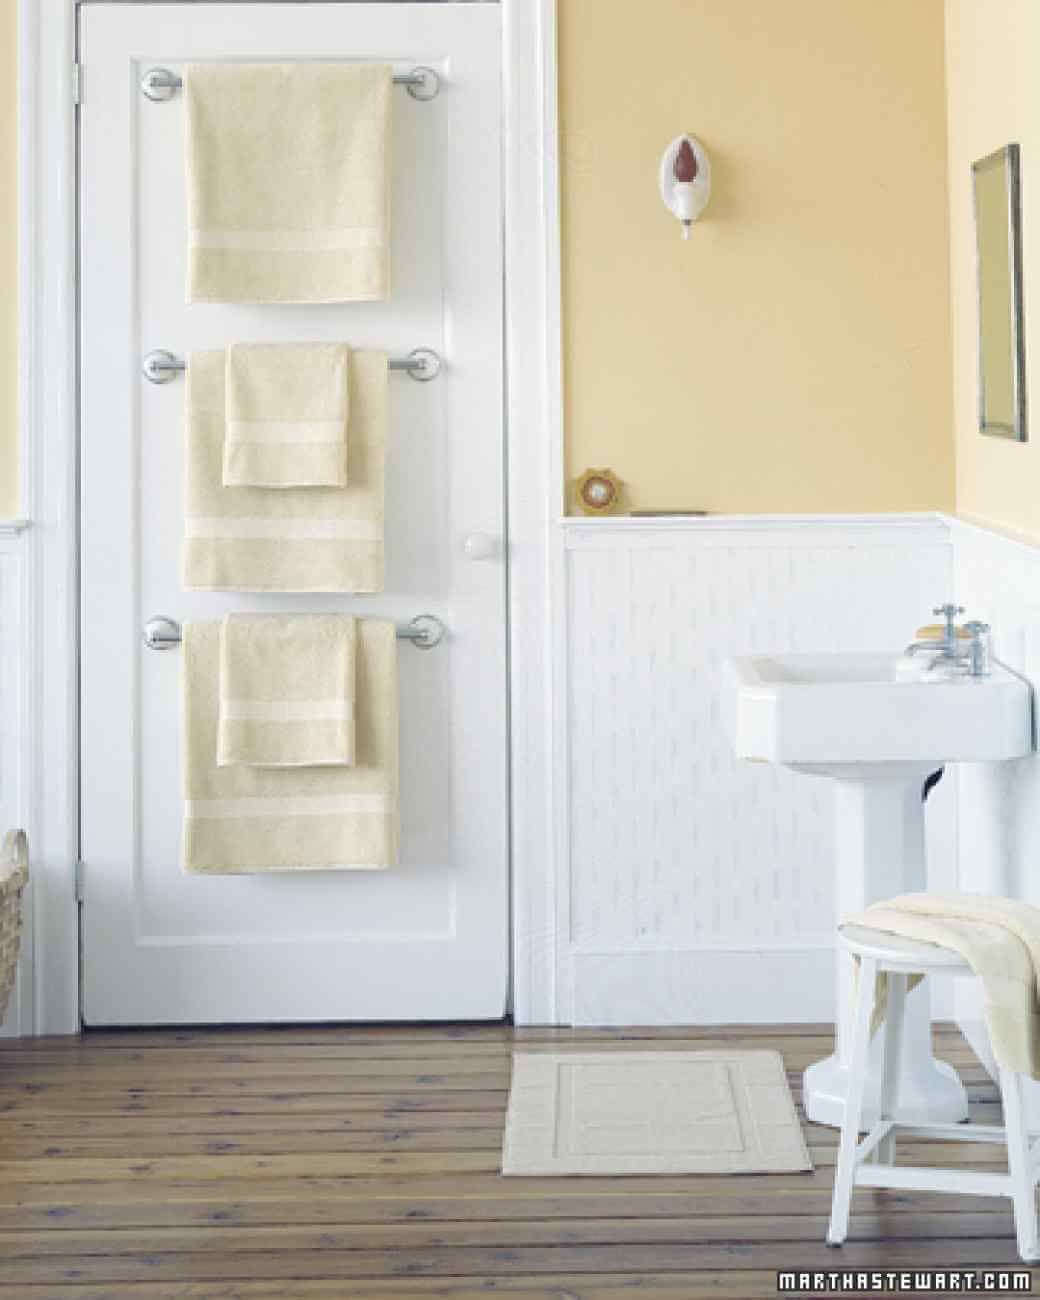 Unique Storage Ideas For A Small Bathroom To Make Yours Bigger - Unique bath towels for small bathroom ideas